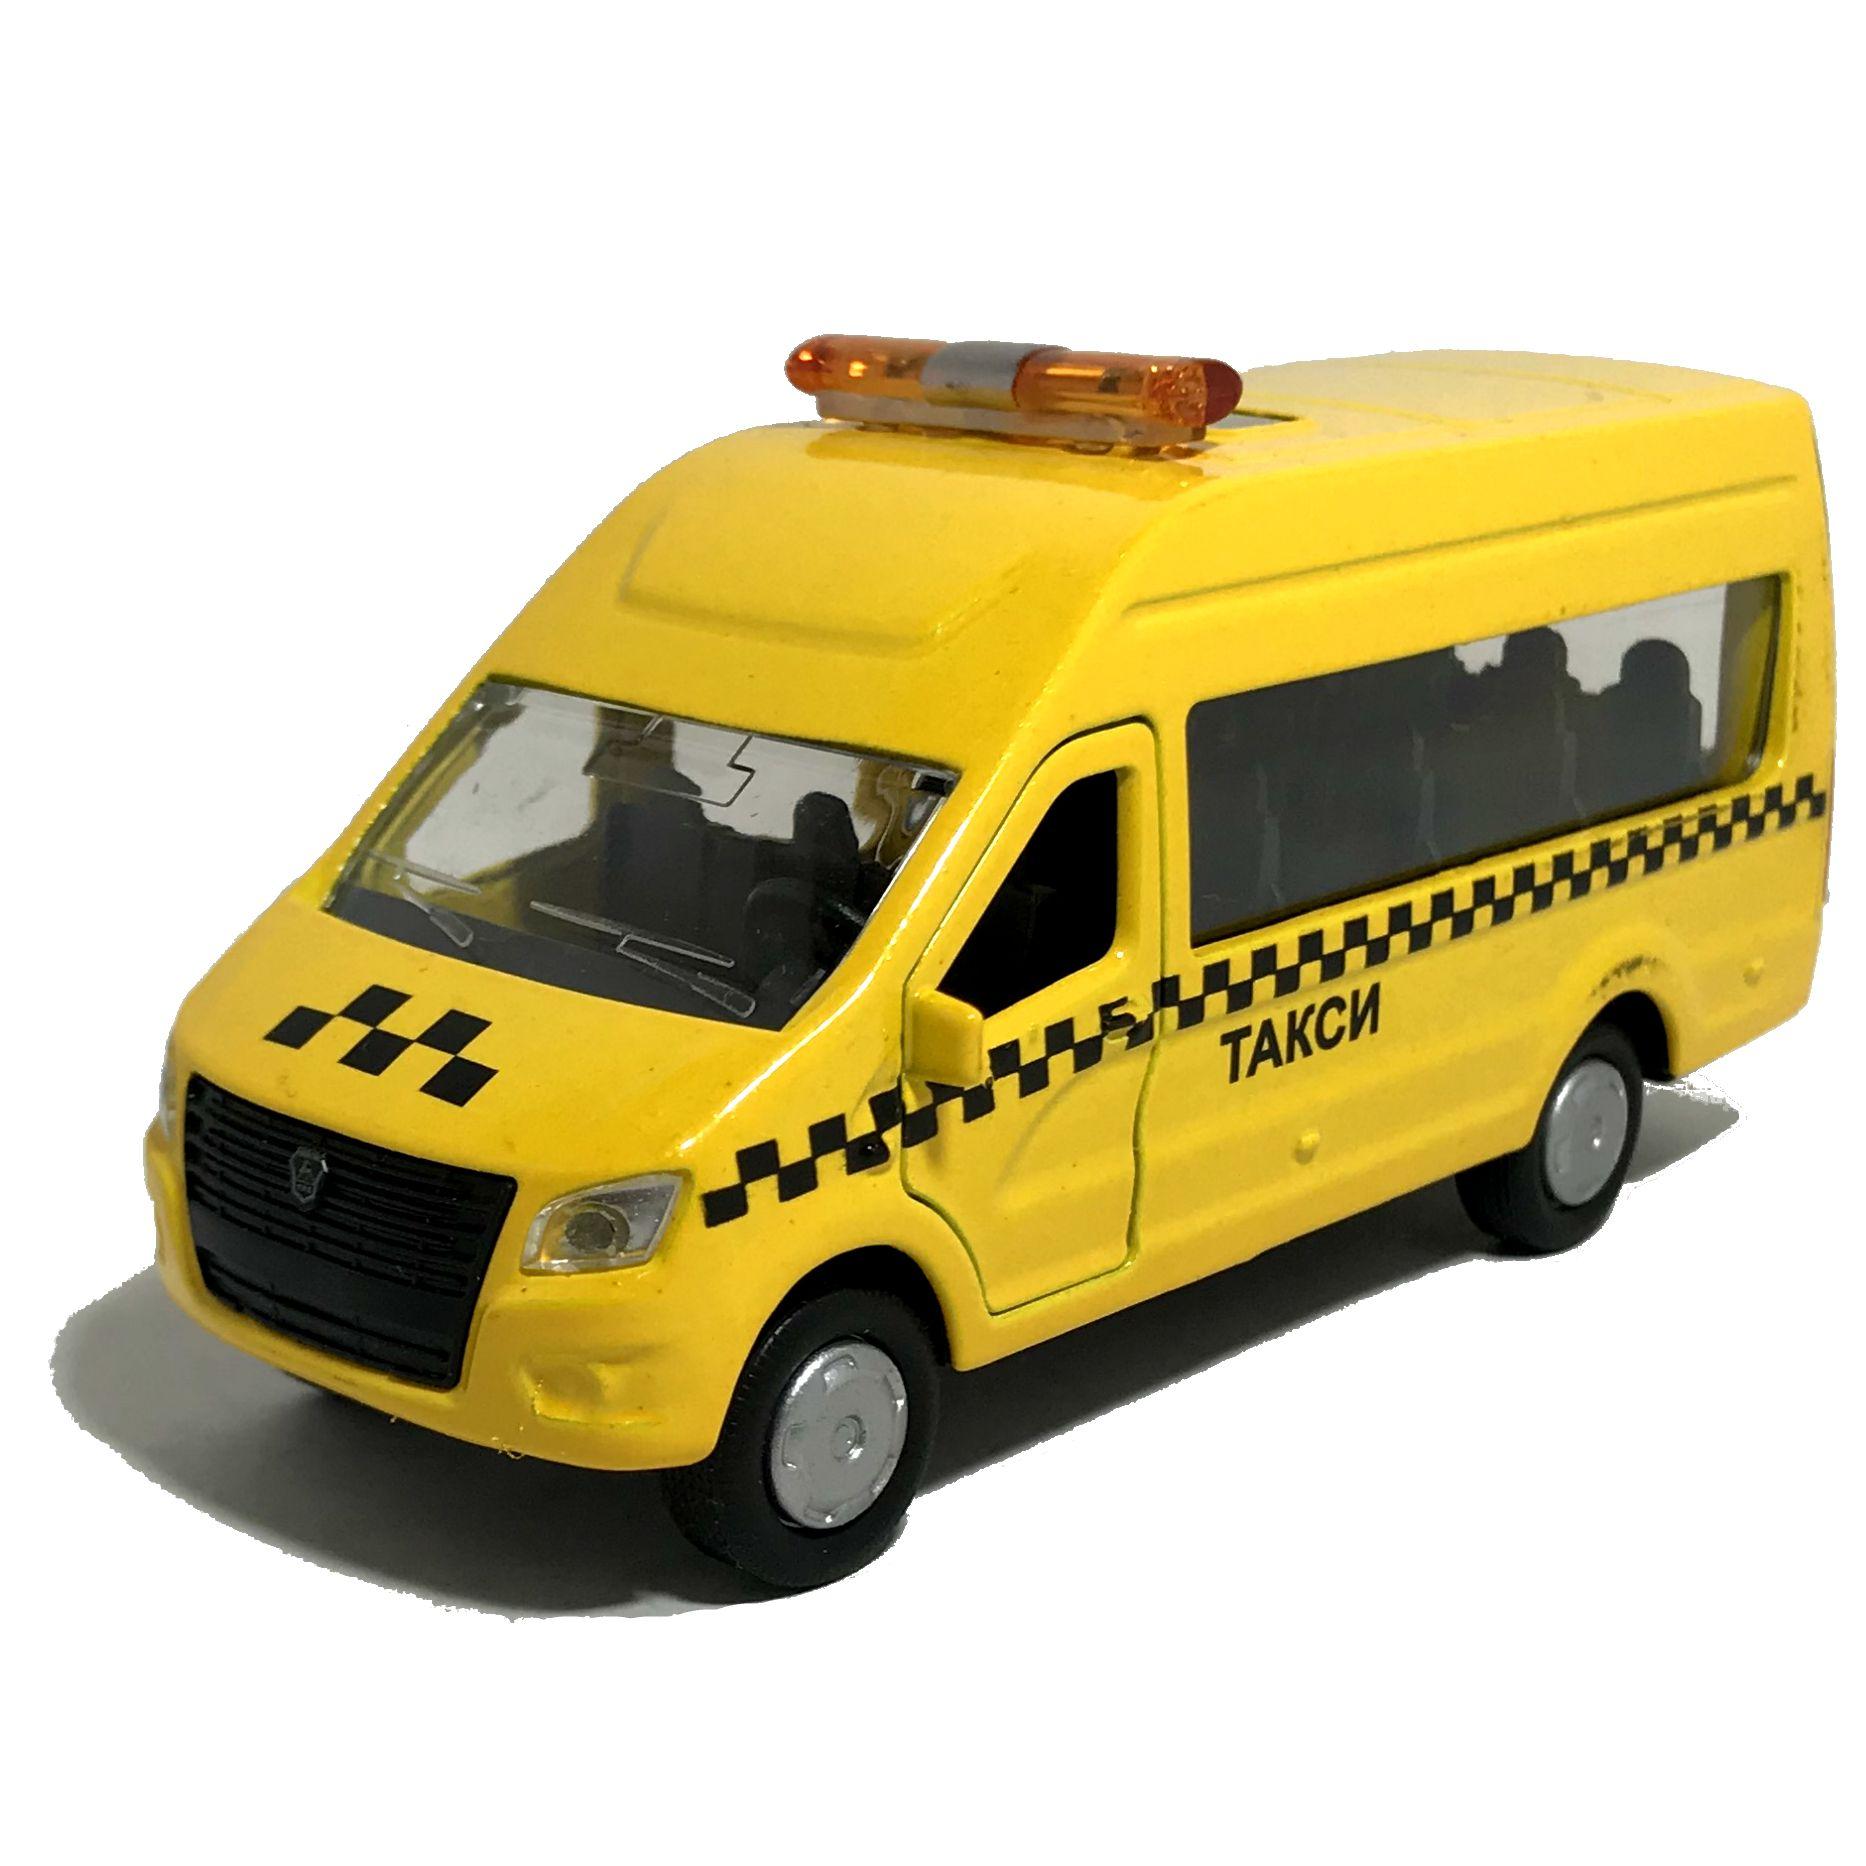 фотки газели такси завести четвероногого